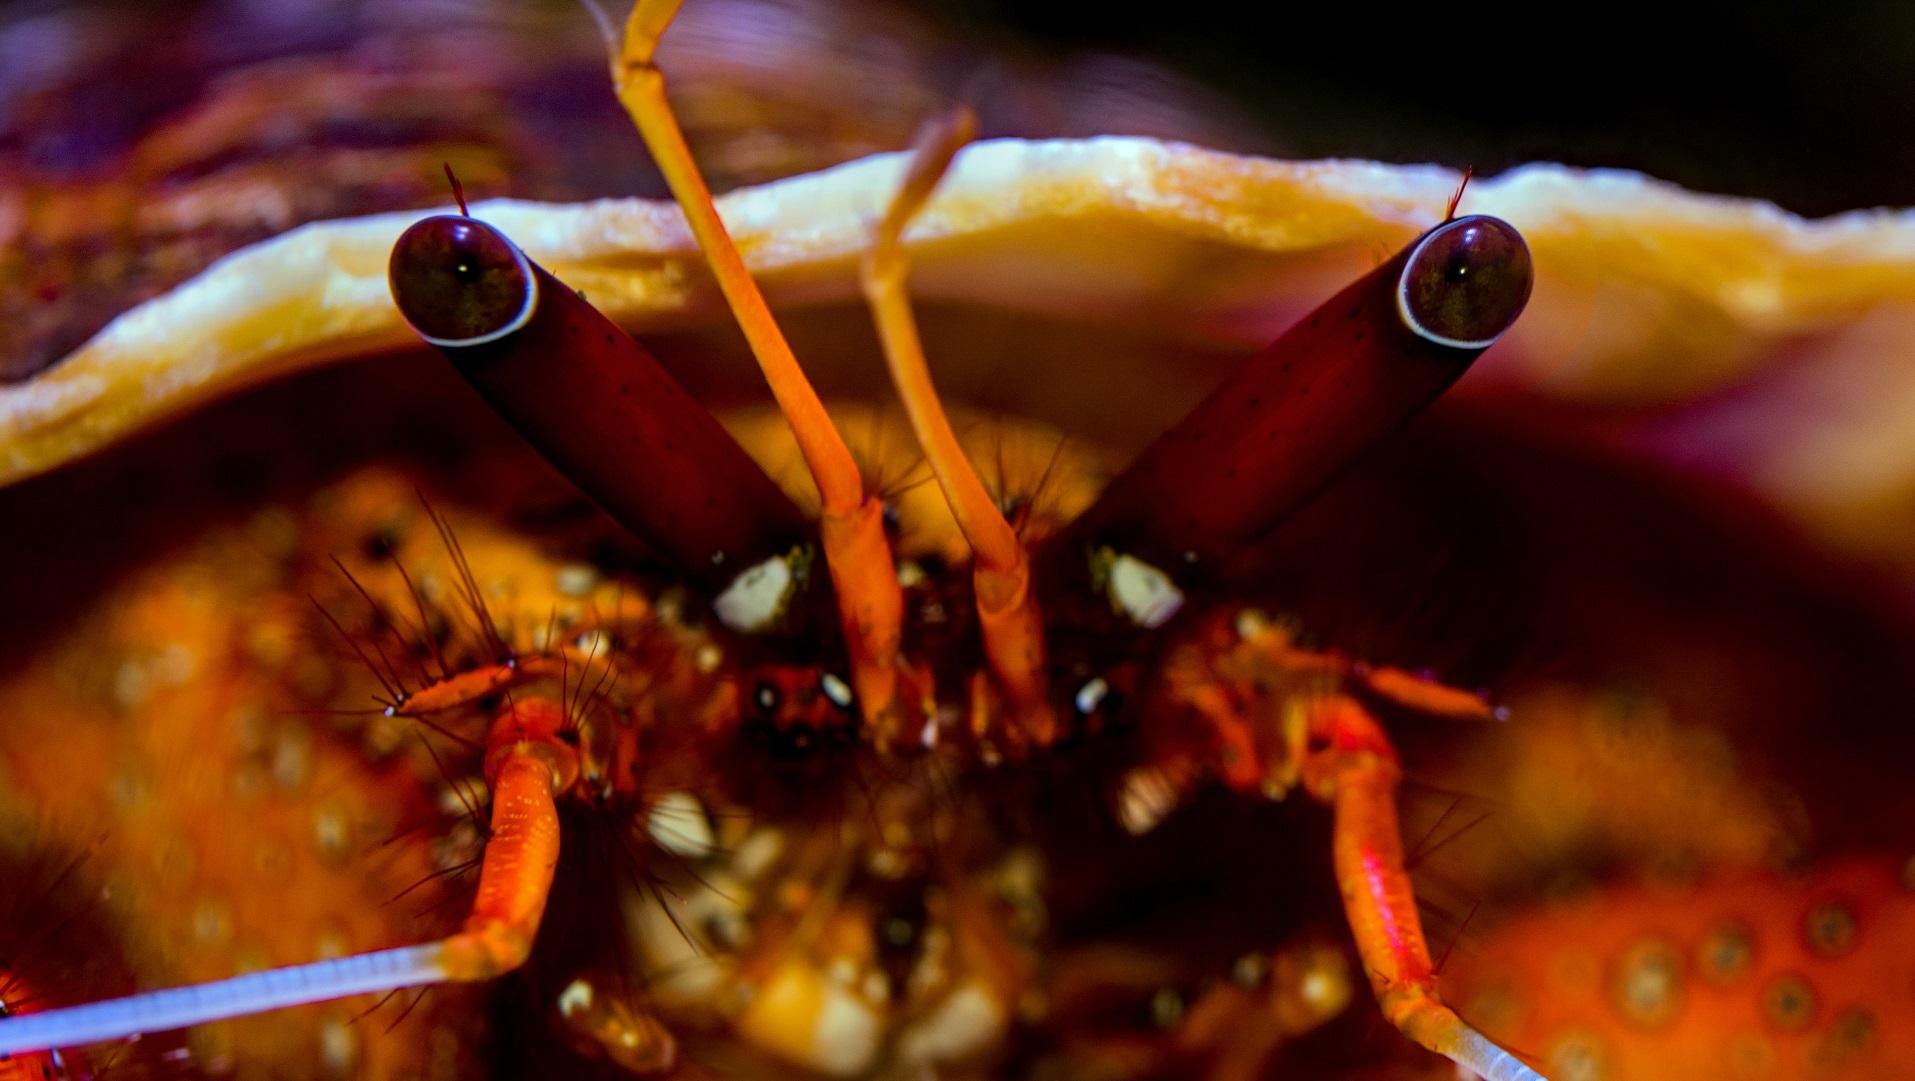 hermit crab eyes